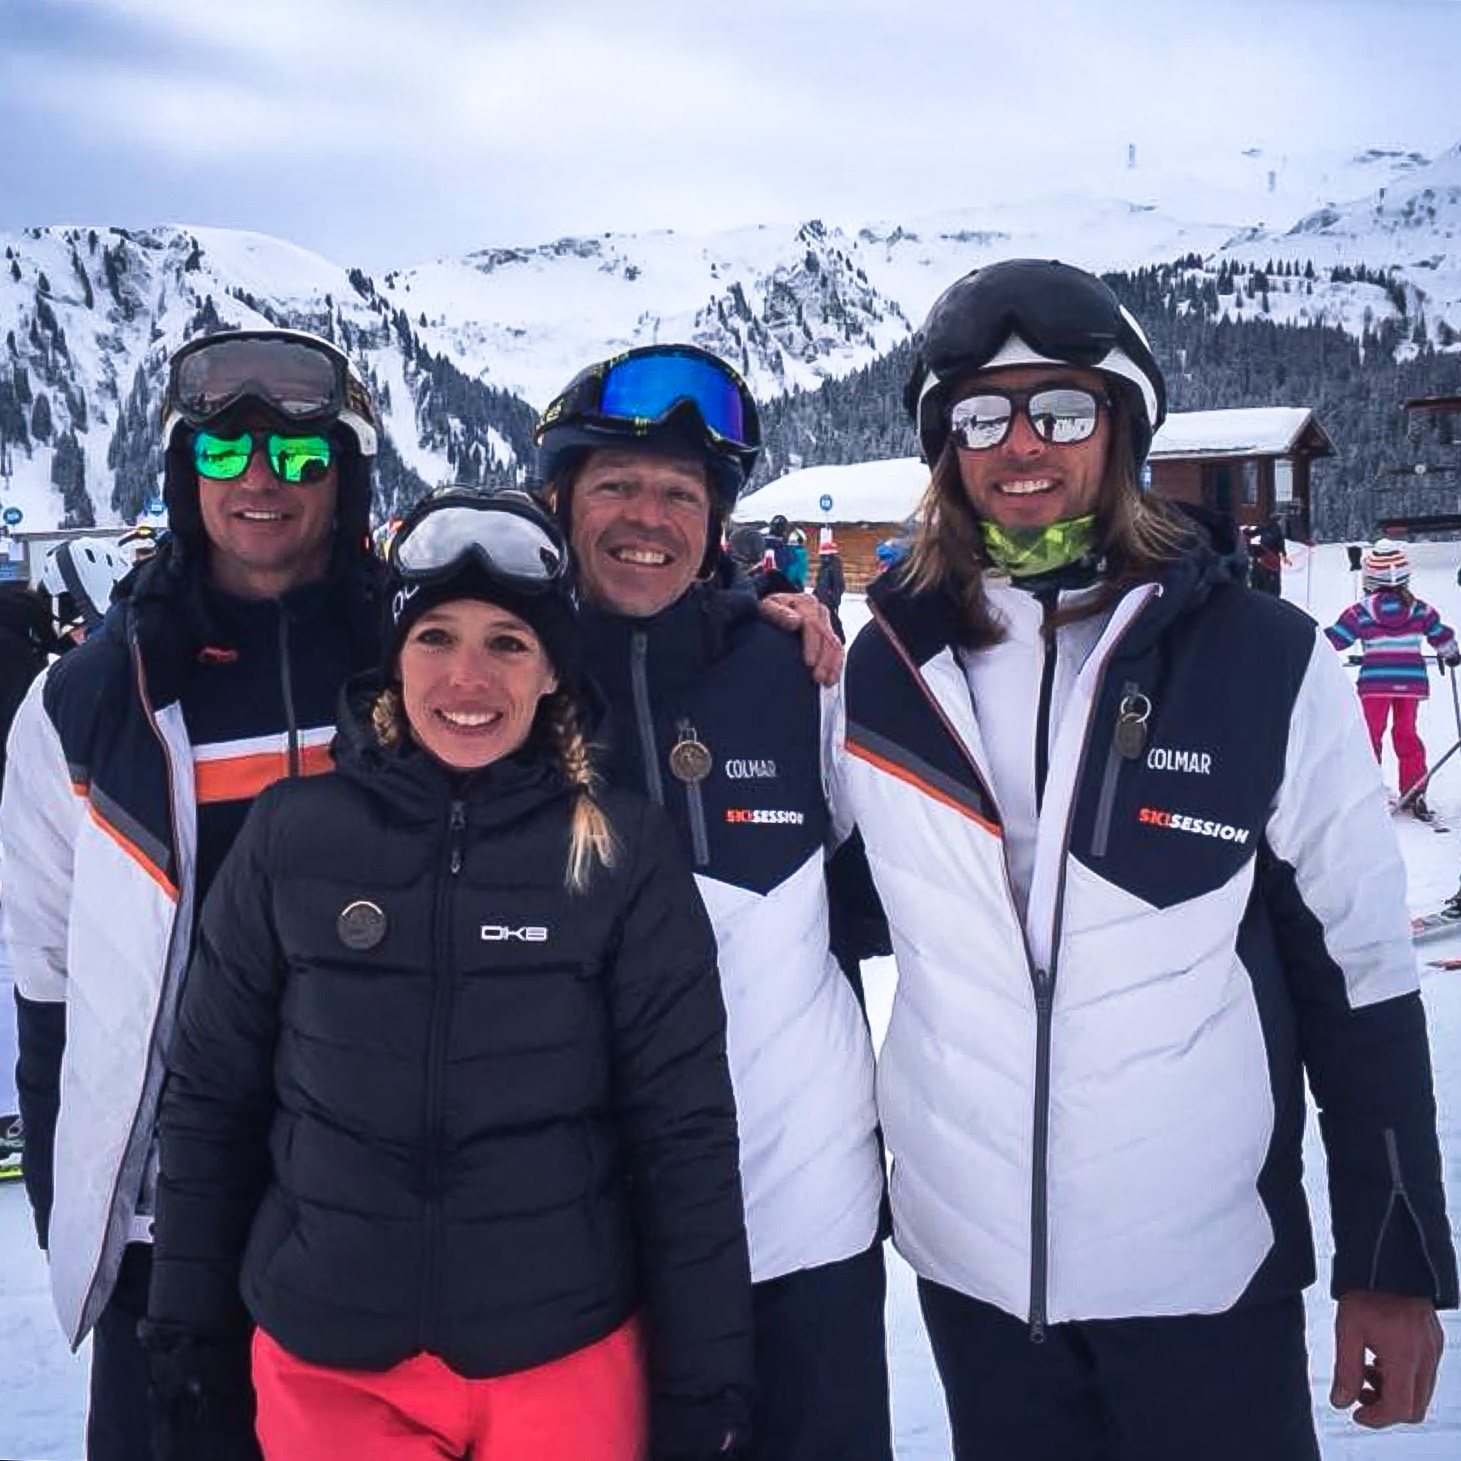 ecole de ski samoens skisession team